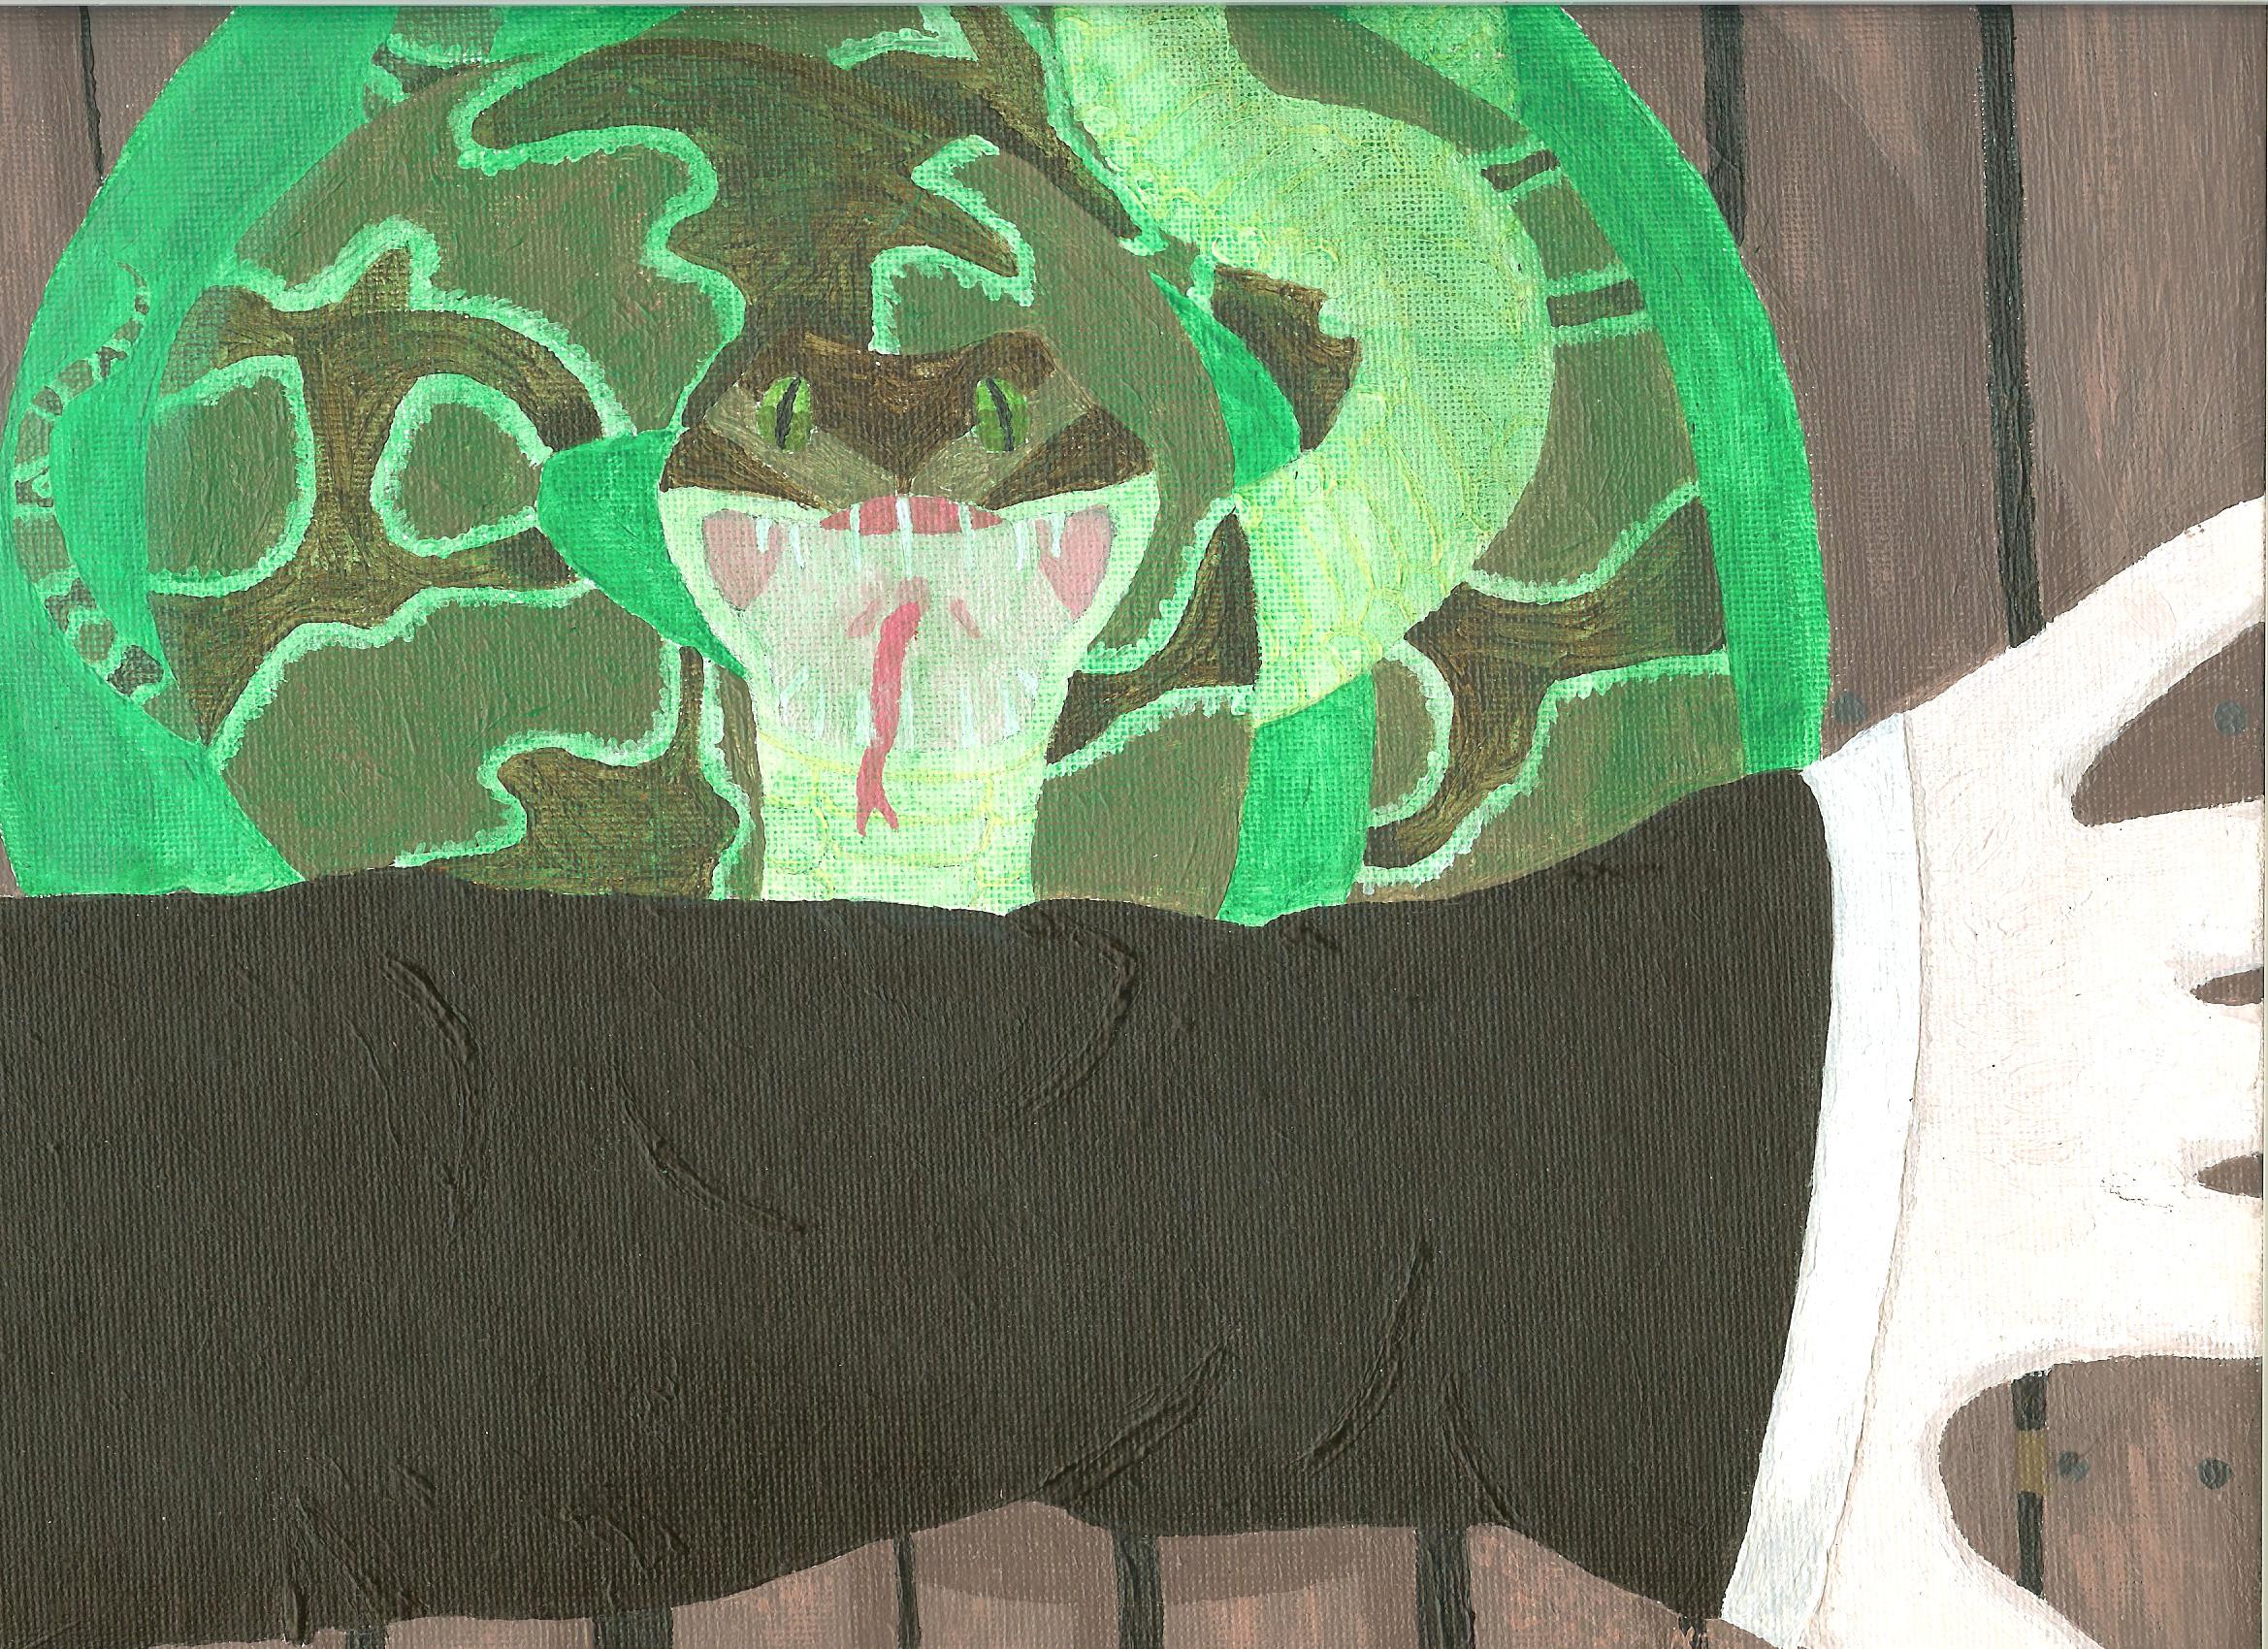 General Art The_death_of_Severus_Snape_by_Nez_Niz92